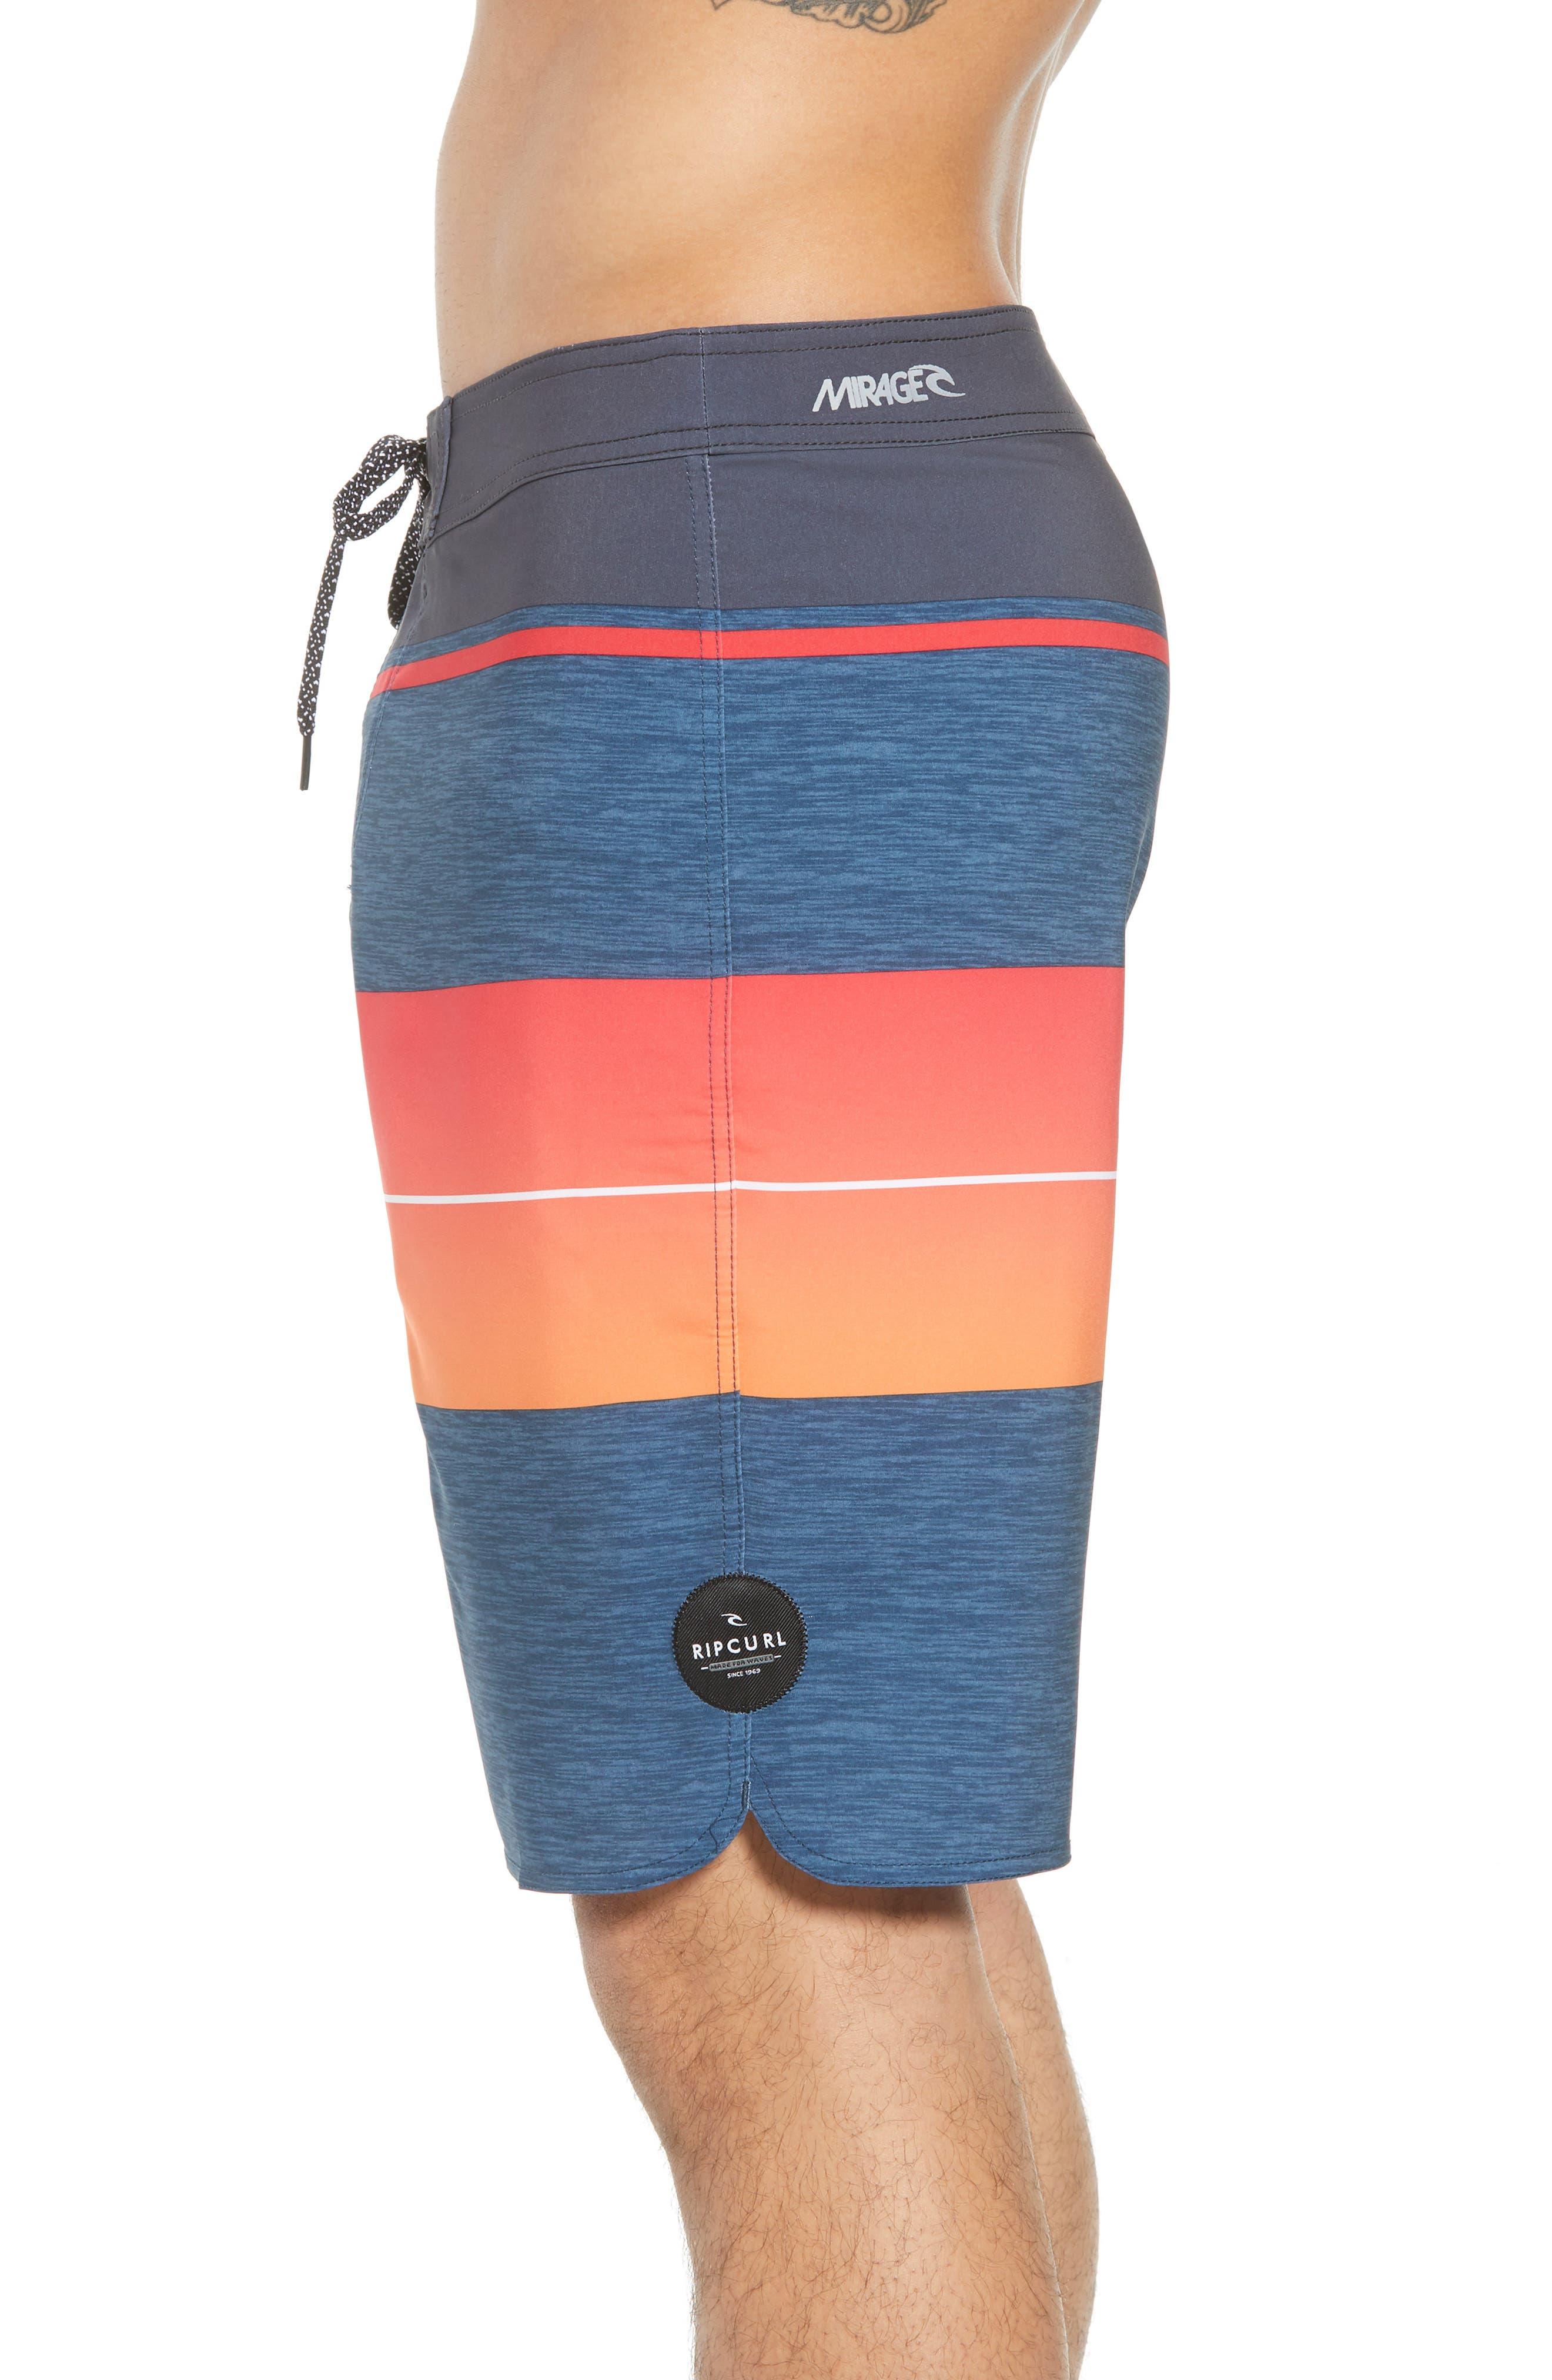 Mirage Eclipse Board Shorts,                             Alternate thumbnail 3, color,                             Orange